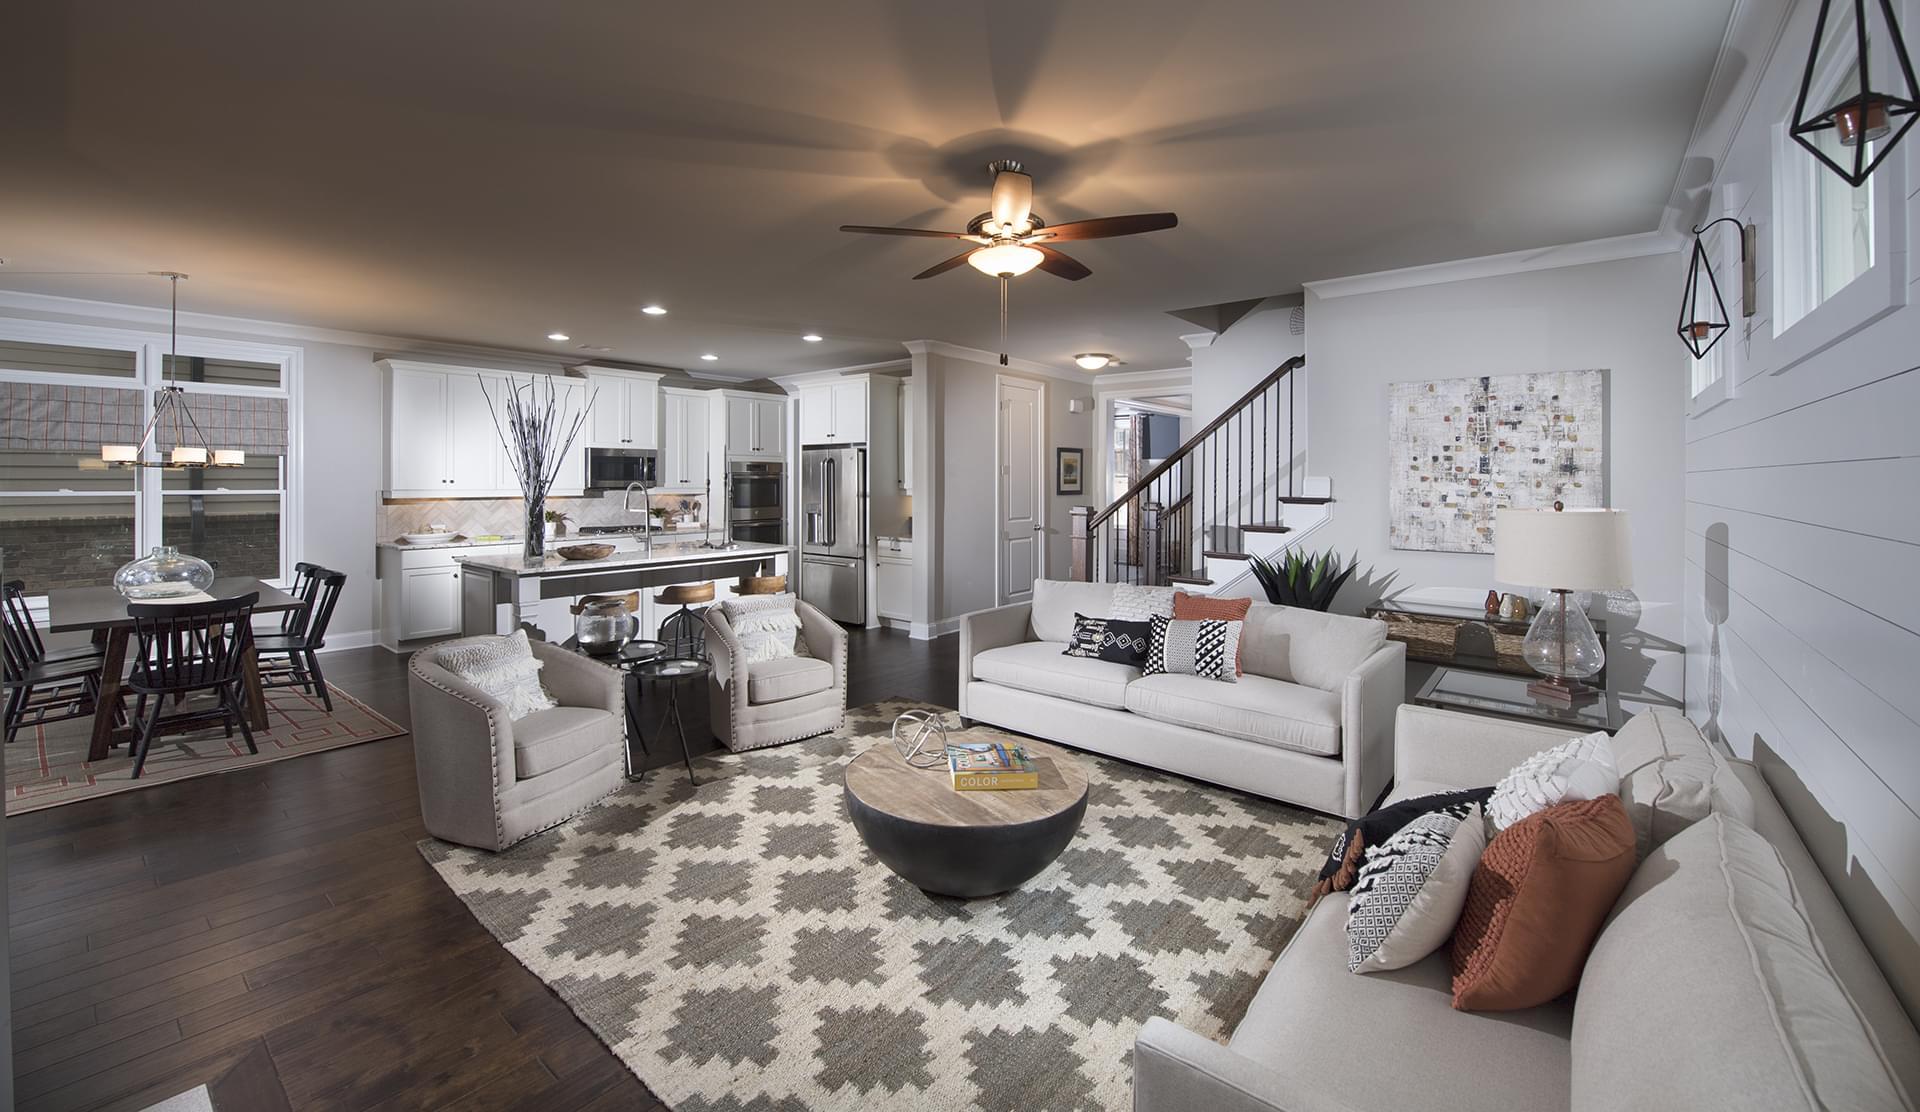 The Raleigh New Home in Alpharetta GA